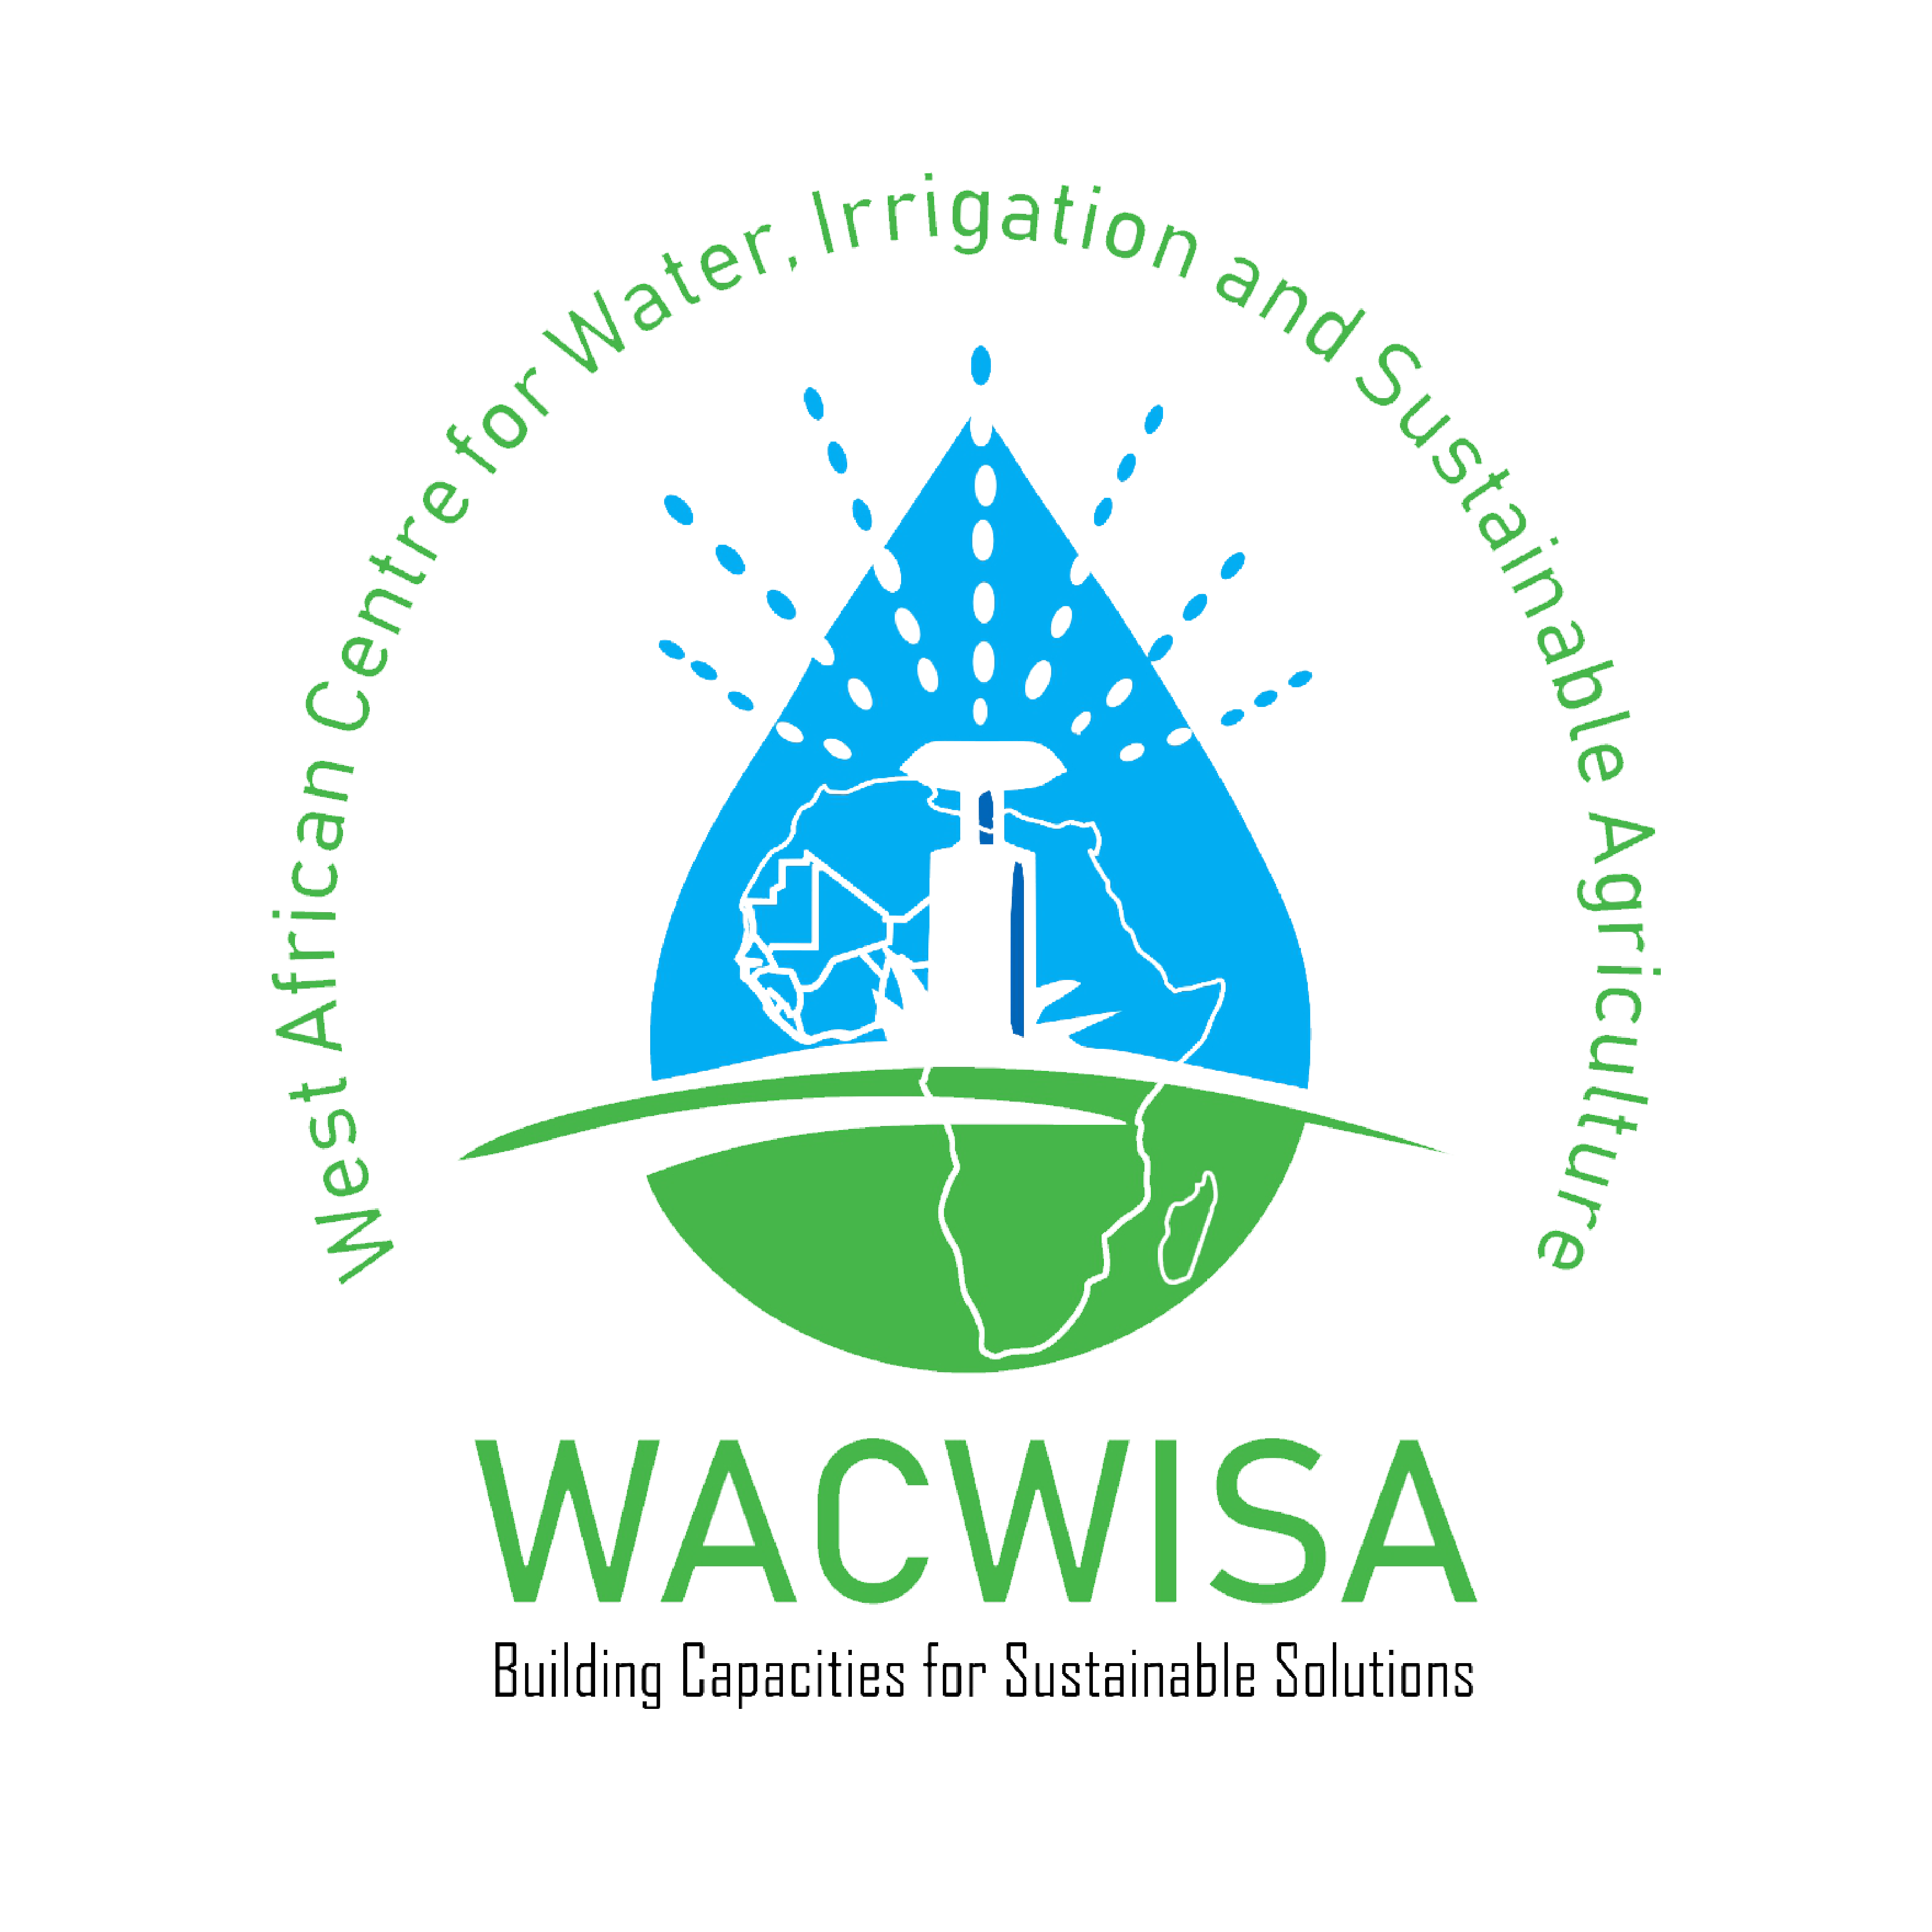 WACWISA – UDS